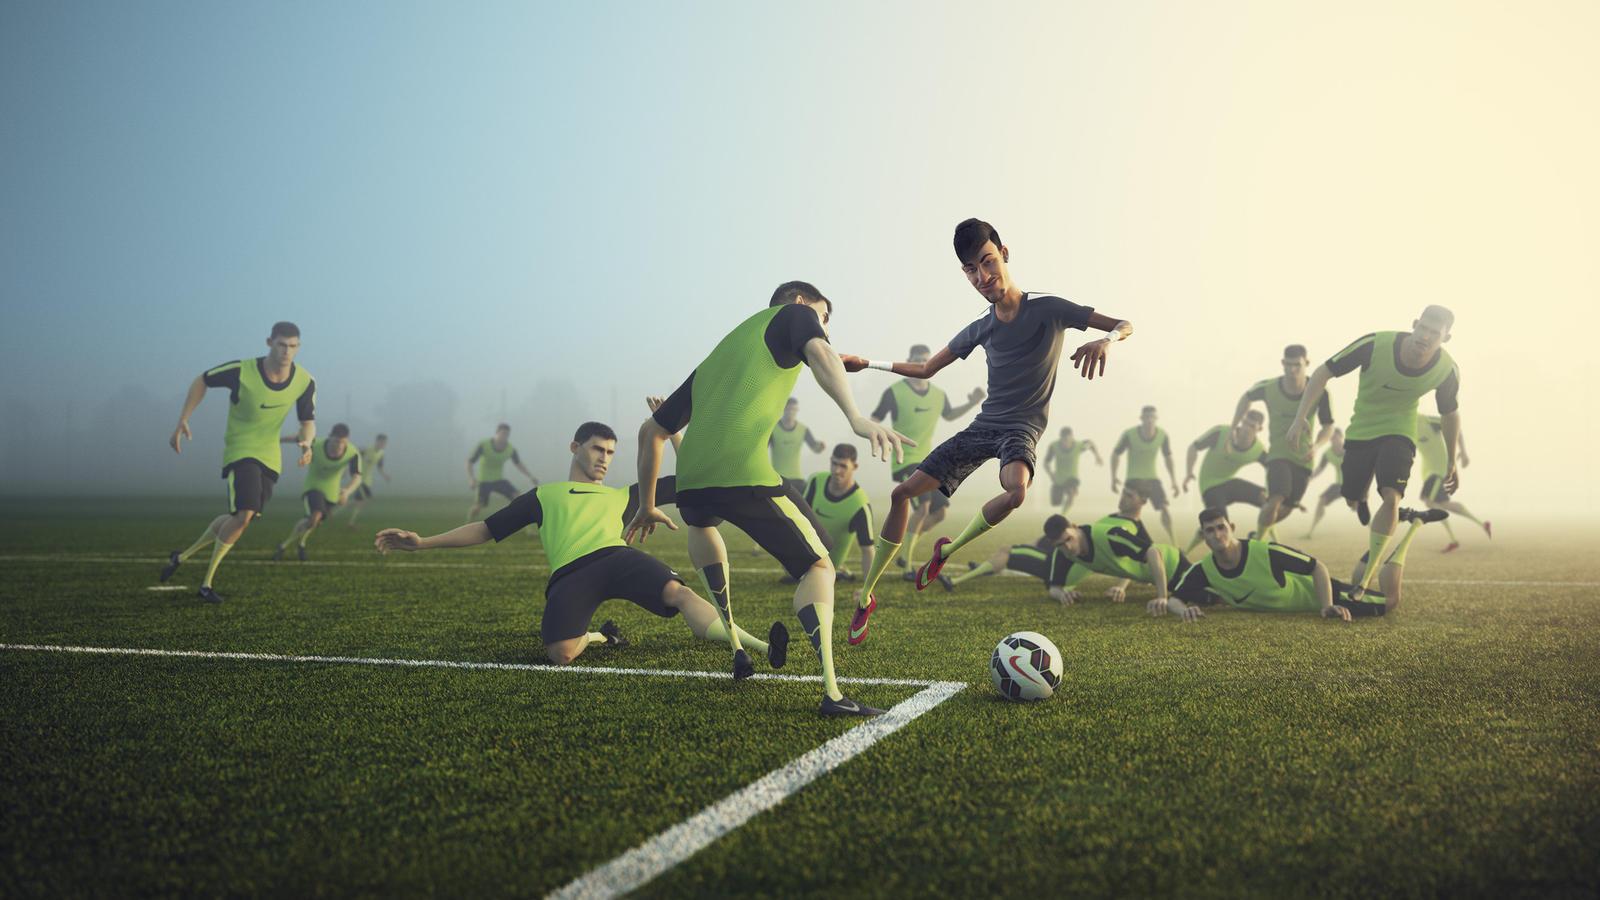 dc3eafb68116 Back to Football - Nike News